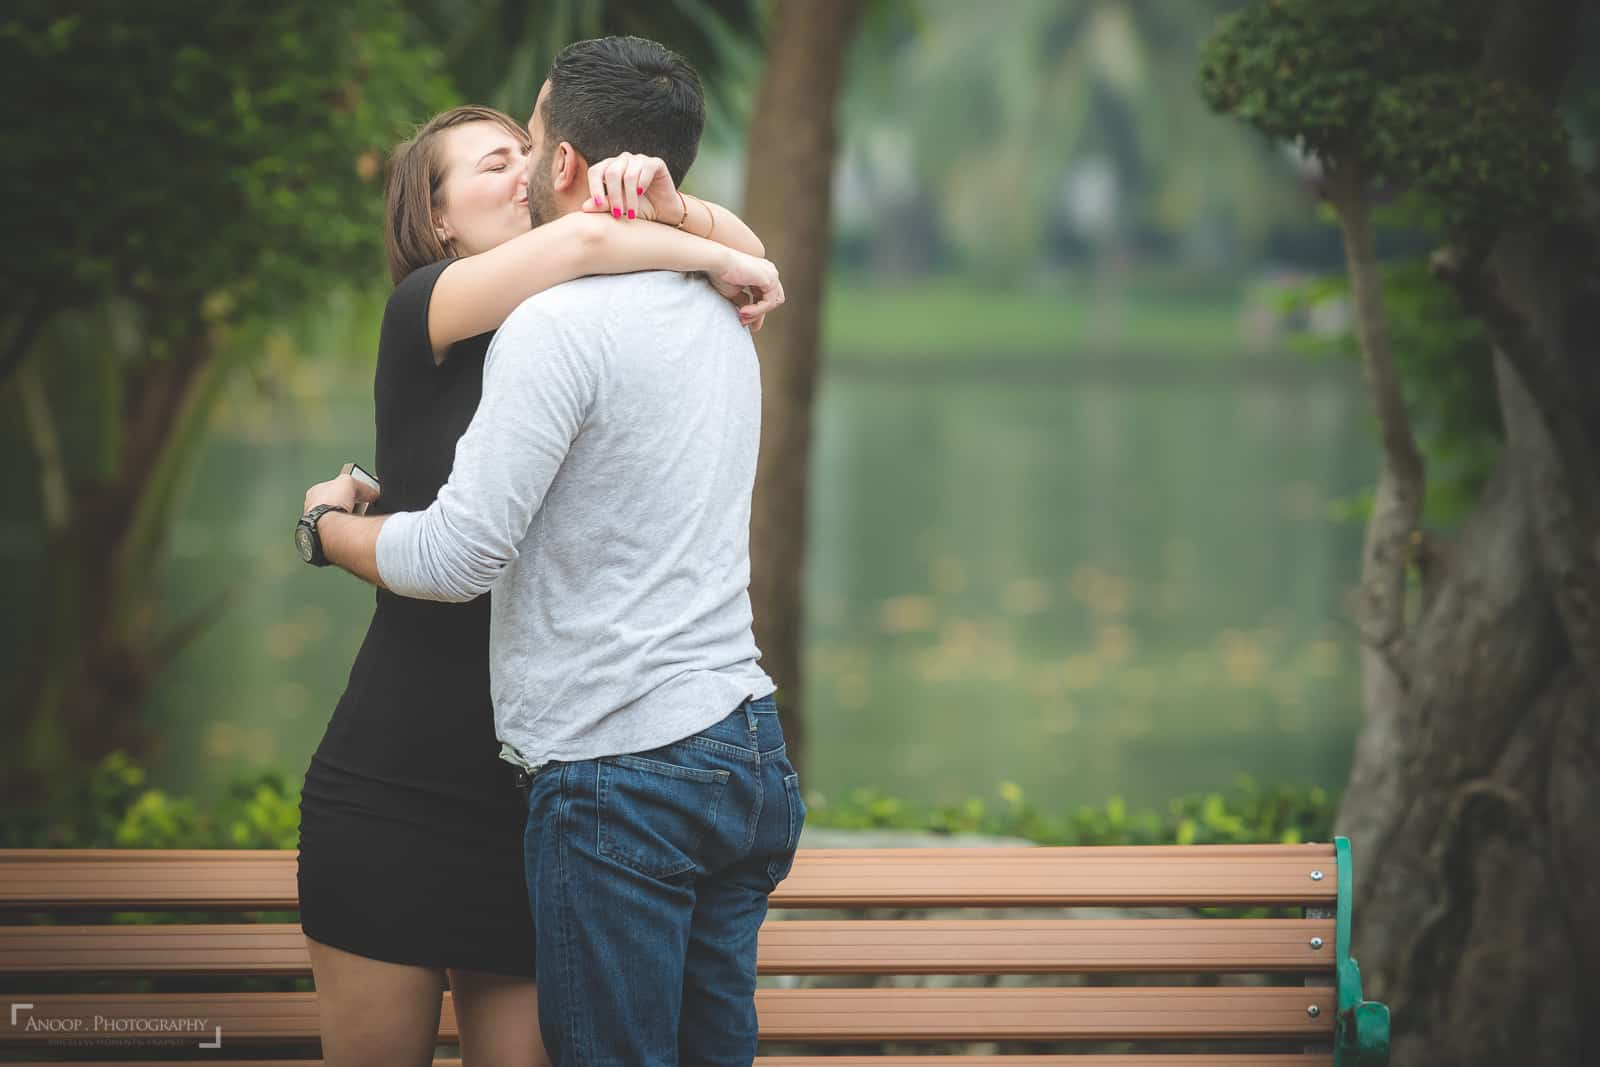 surprise-proposal-photography-thailand-marriage-proposal-ideas-photos15